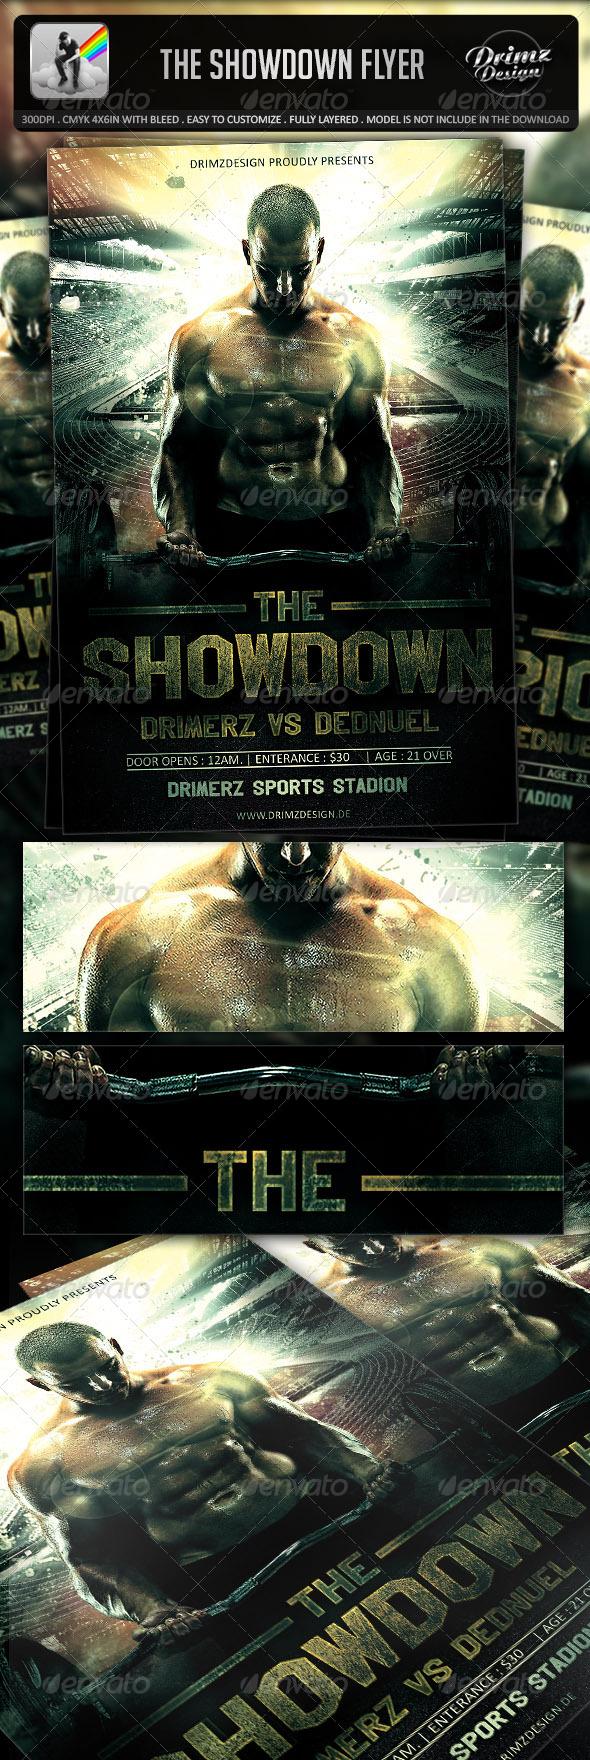 The Showdown Flyer